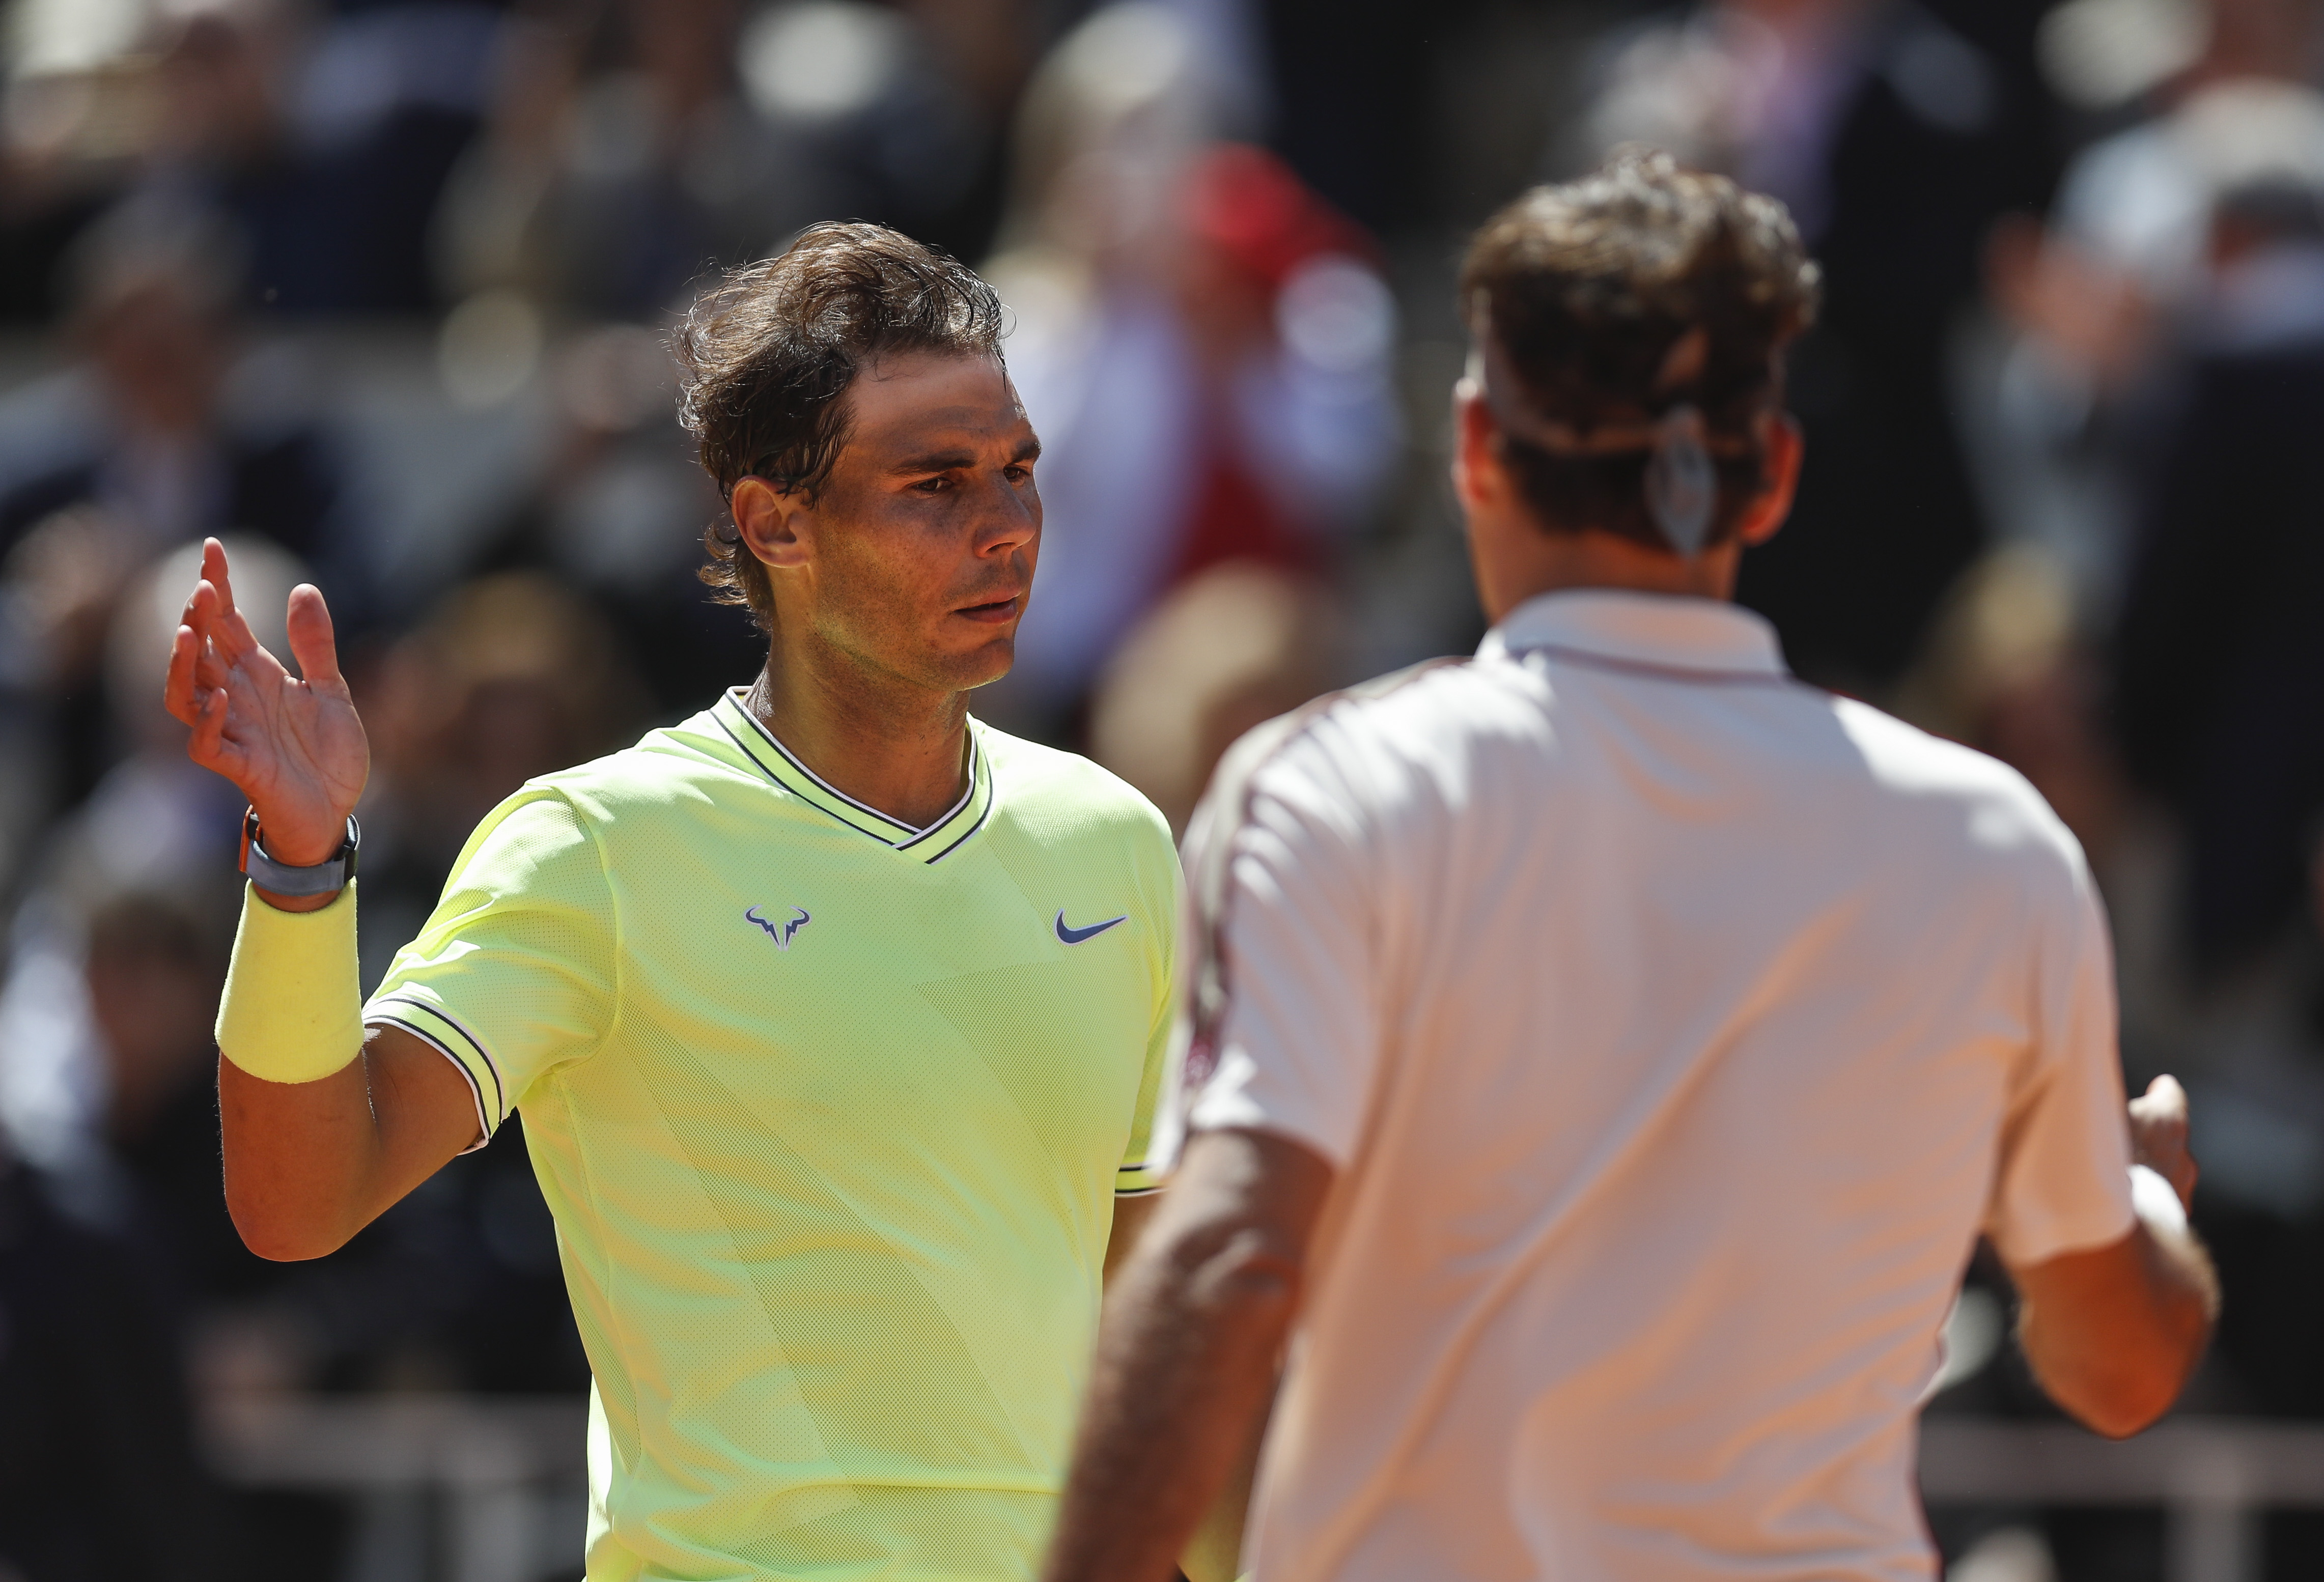 Tennis - Wimbledon - Wimbledon : Federer et Nadal encore ensemble, Djokovic plutôt épargné